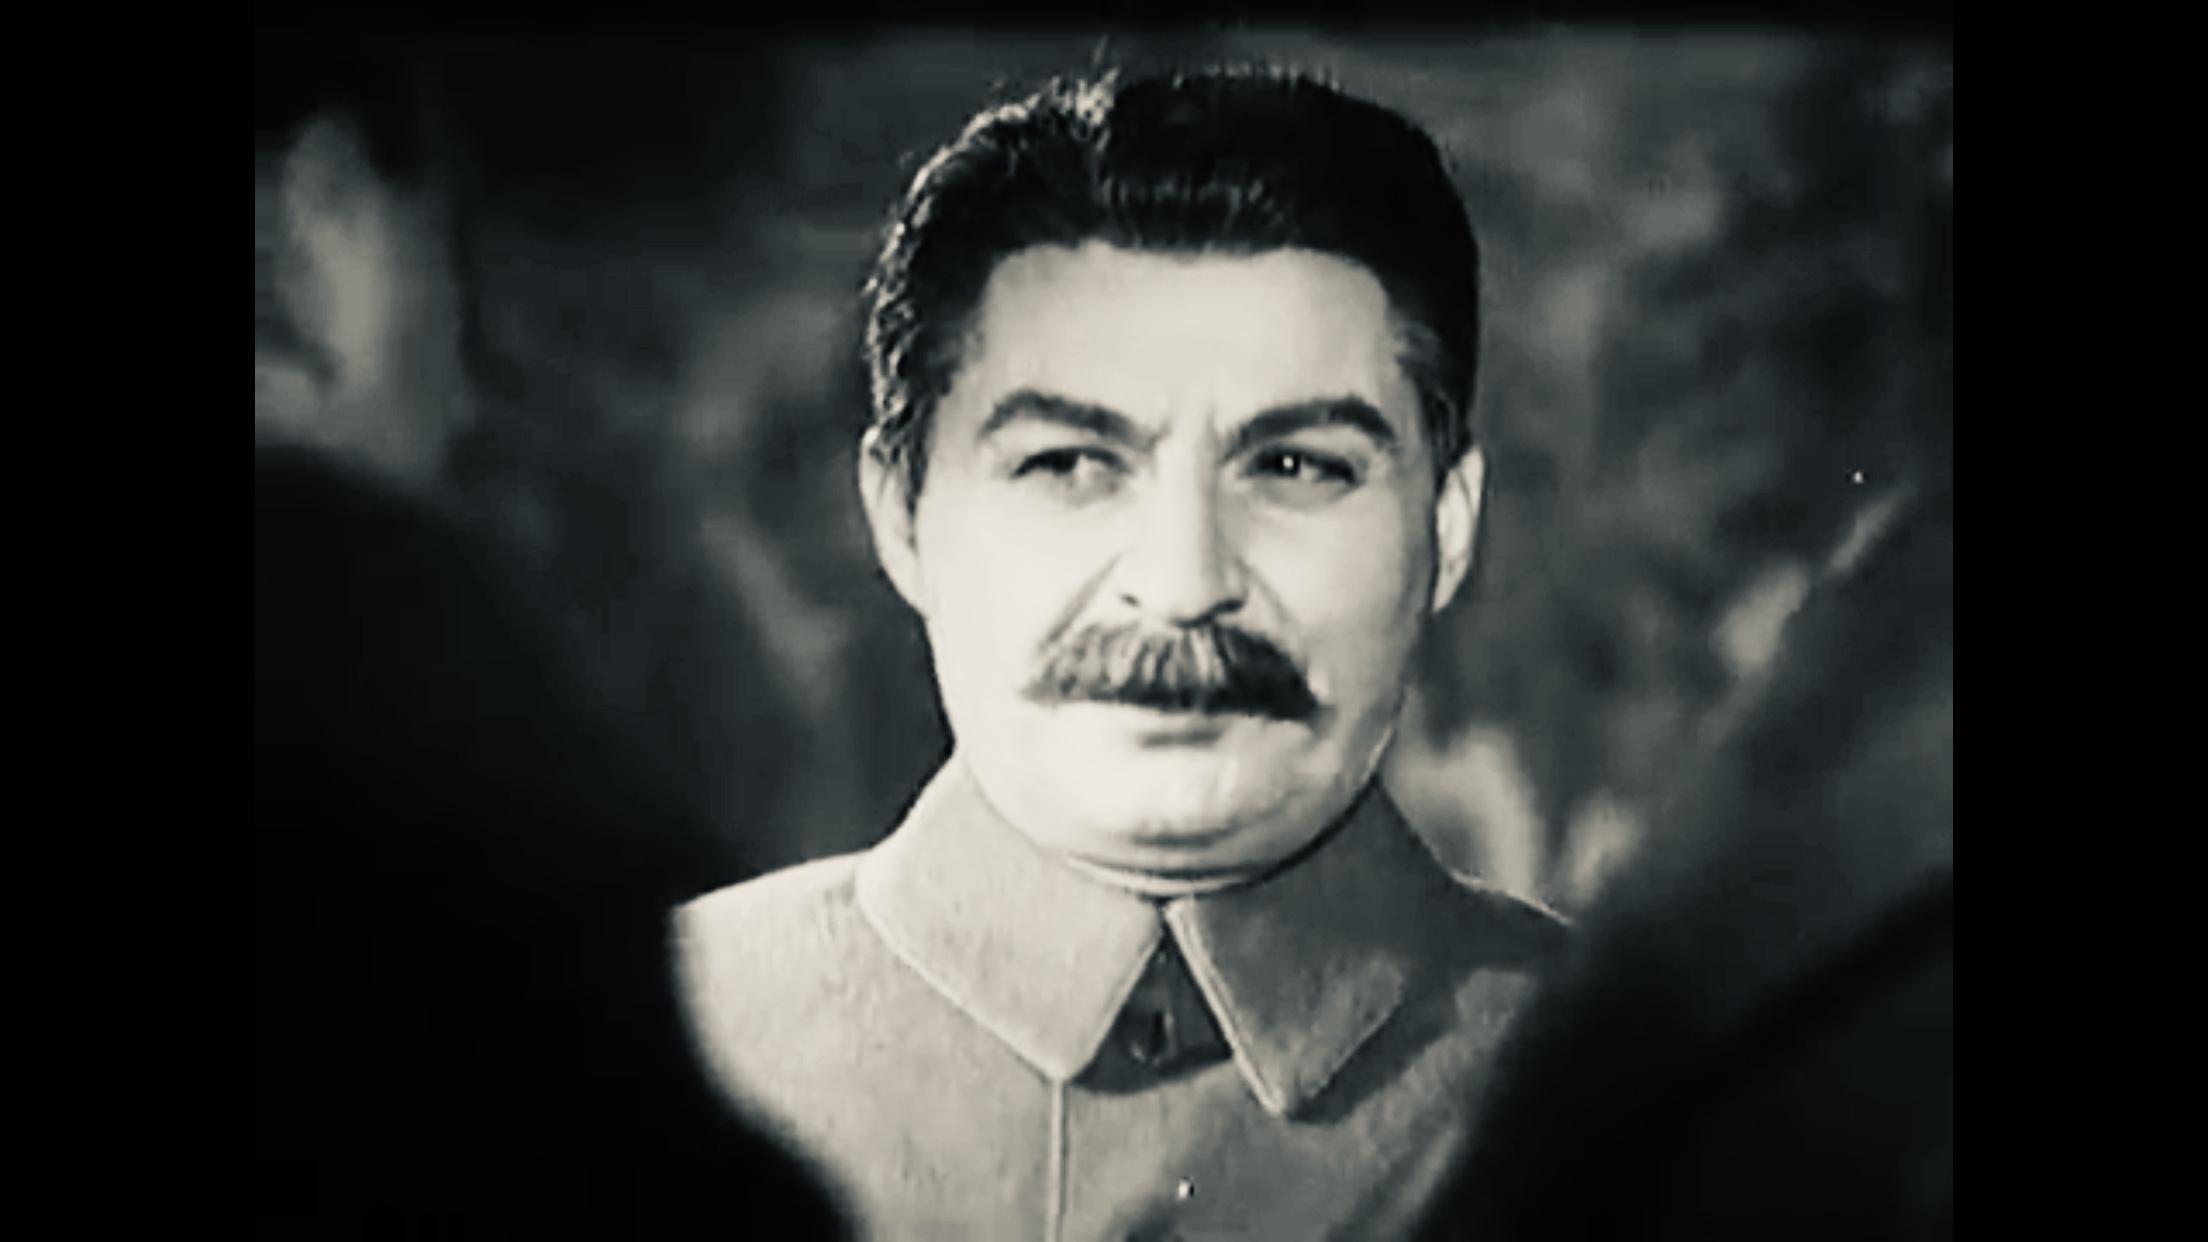 Chkalov